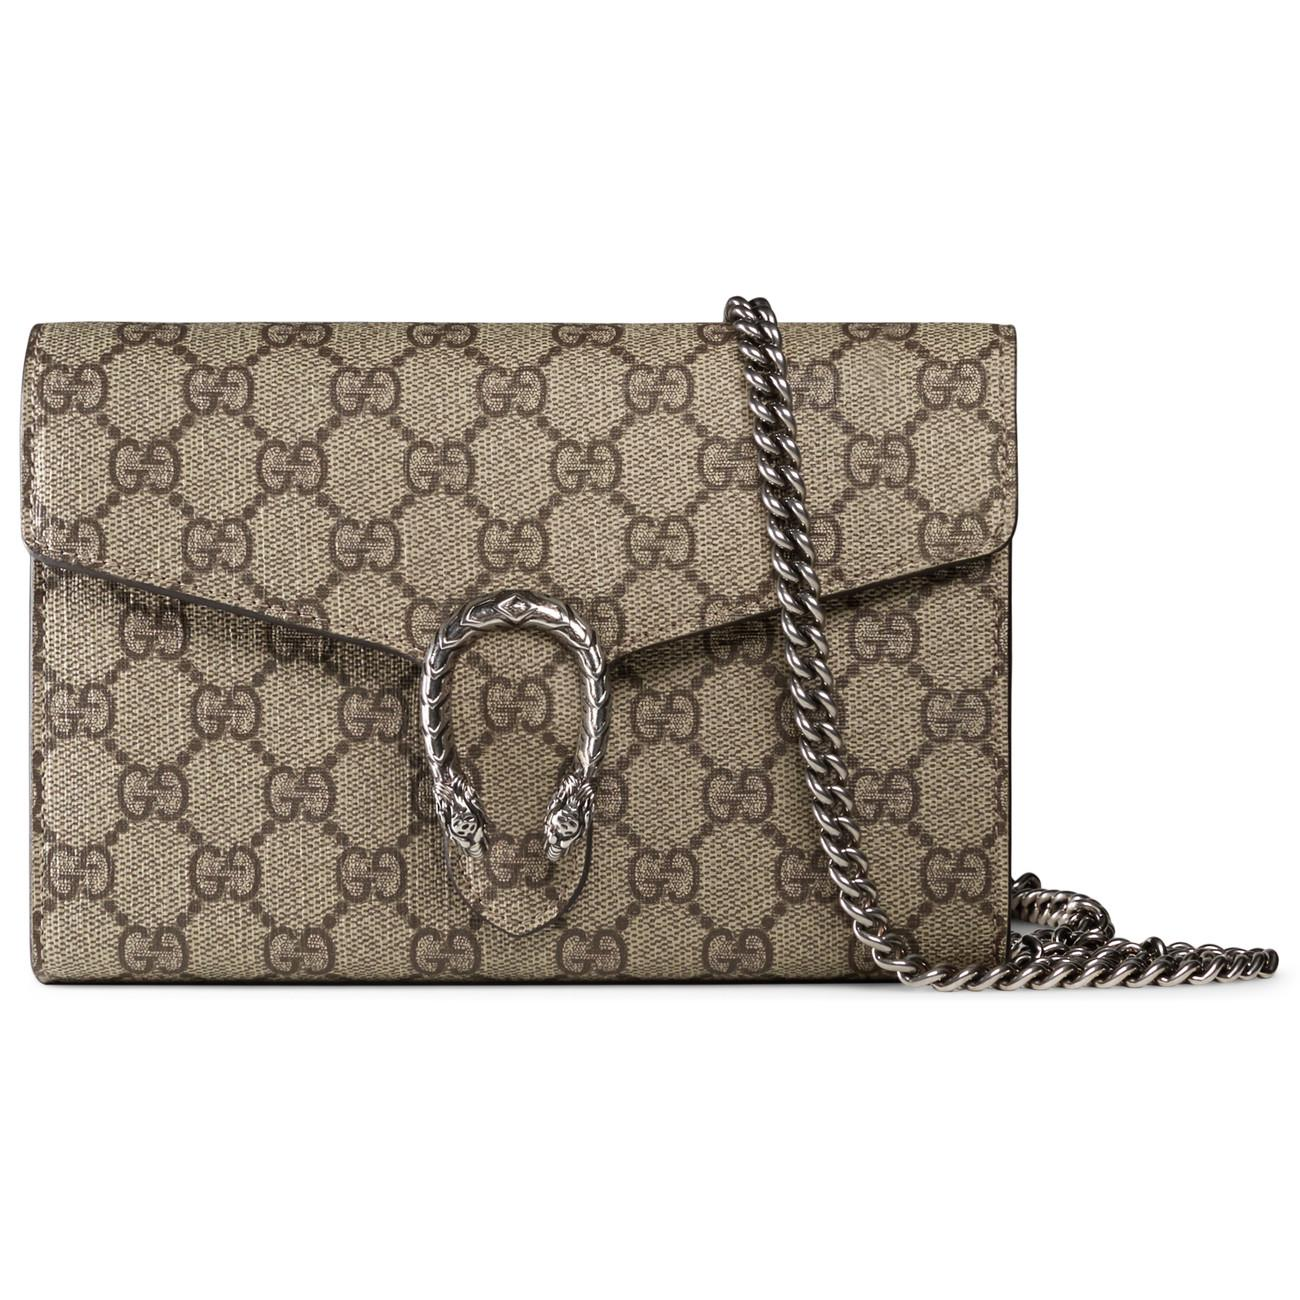 aa959c5db9ce Gucci Dionysus GG Supreme Chain Shoulder Bag - Lyst